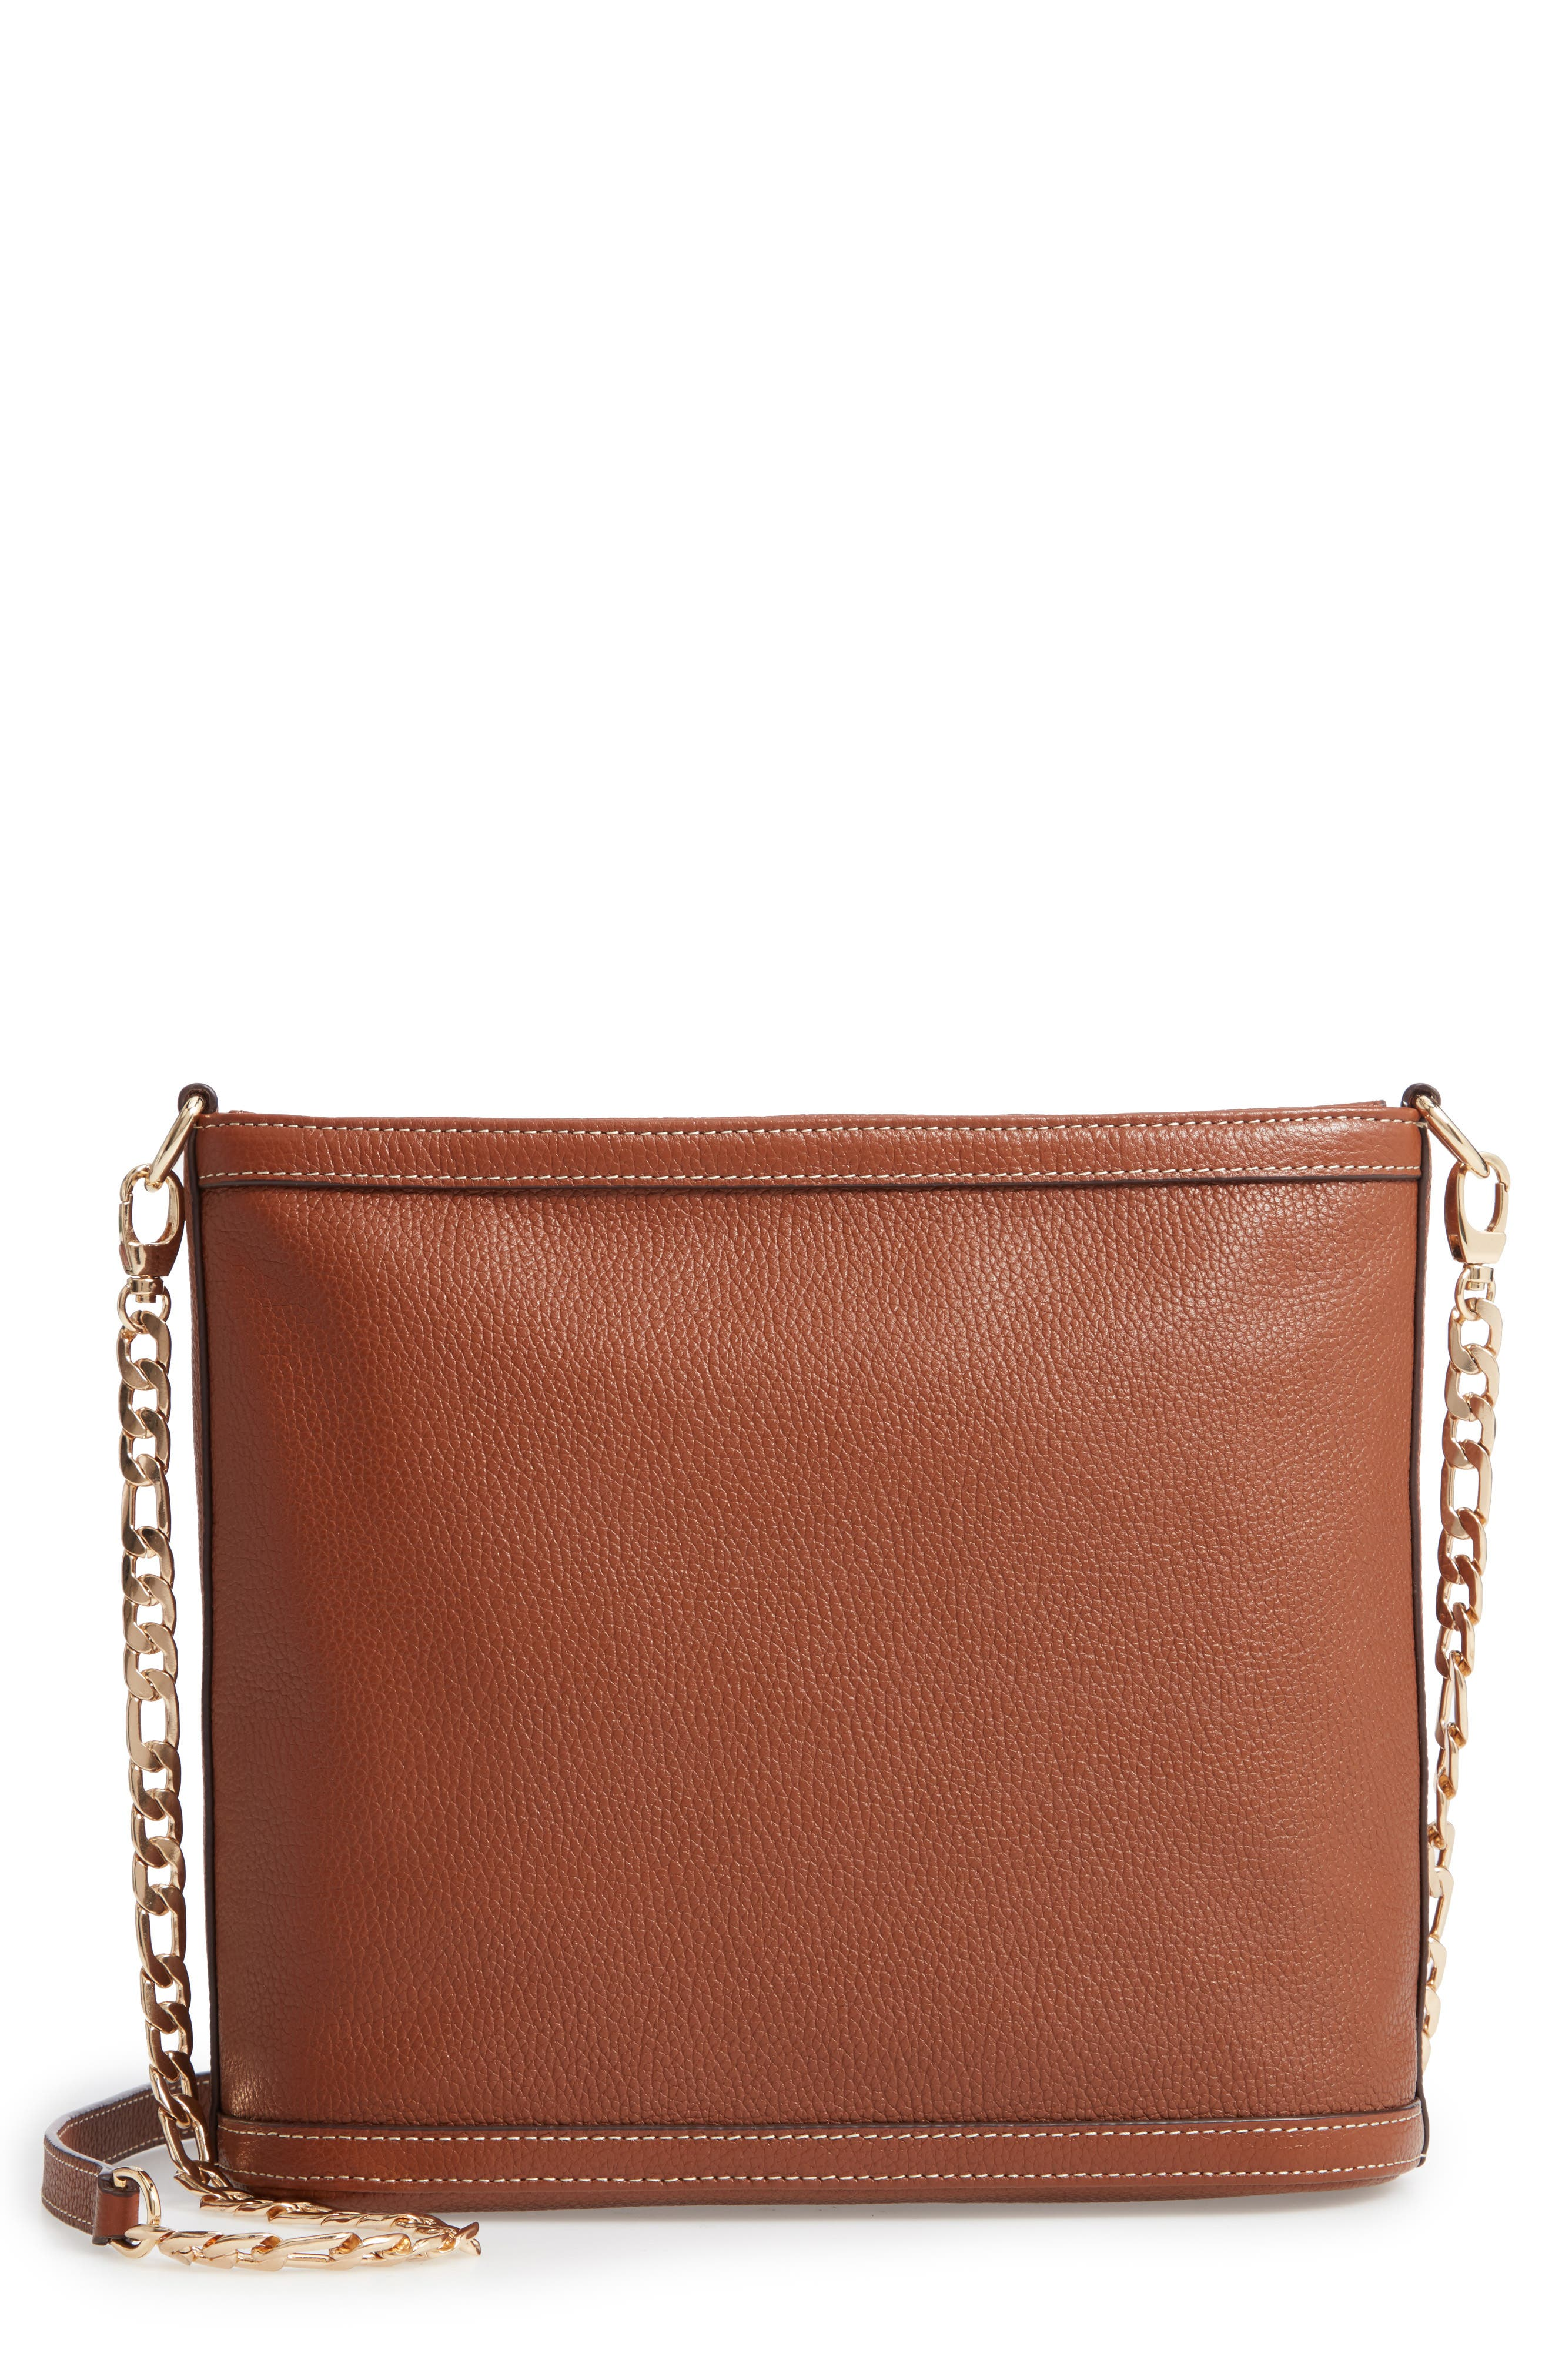 NORDSTROM,                             Maribel Leather Crossbody Bag,                             Main thumbnail 1, color,                             BROWN AZTEC